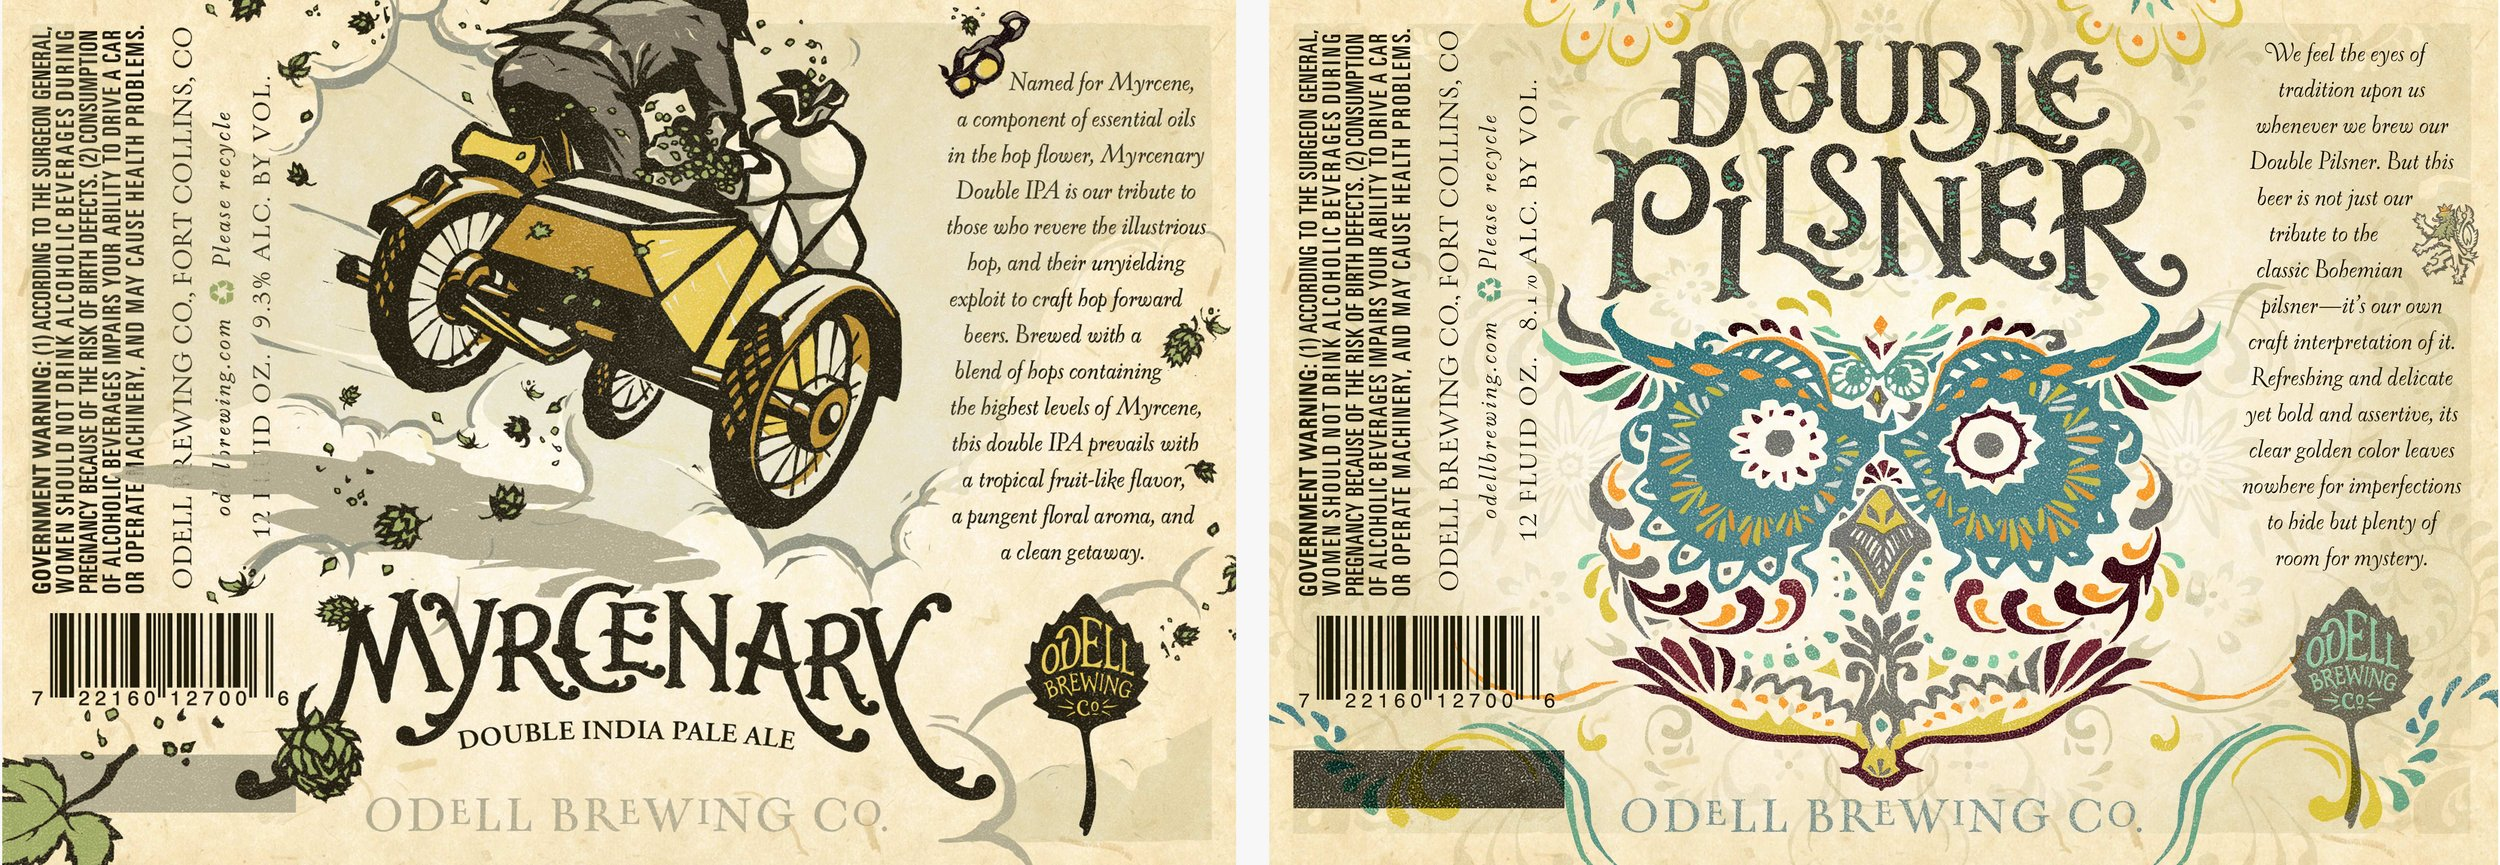 Odell-Brewing-Label-Design-Branding_Myrcenary.jpg